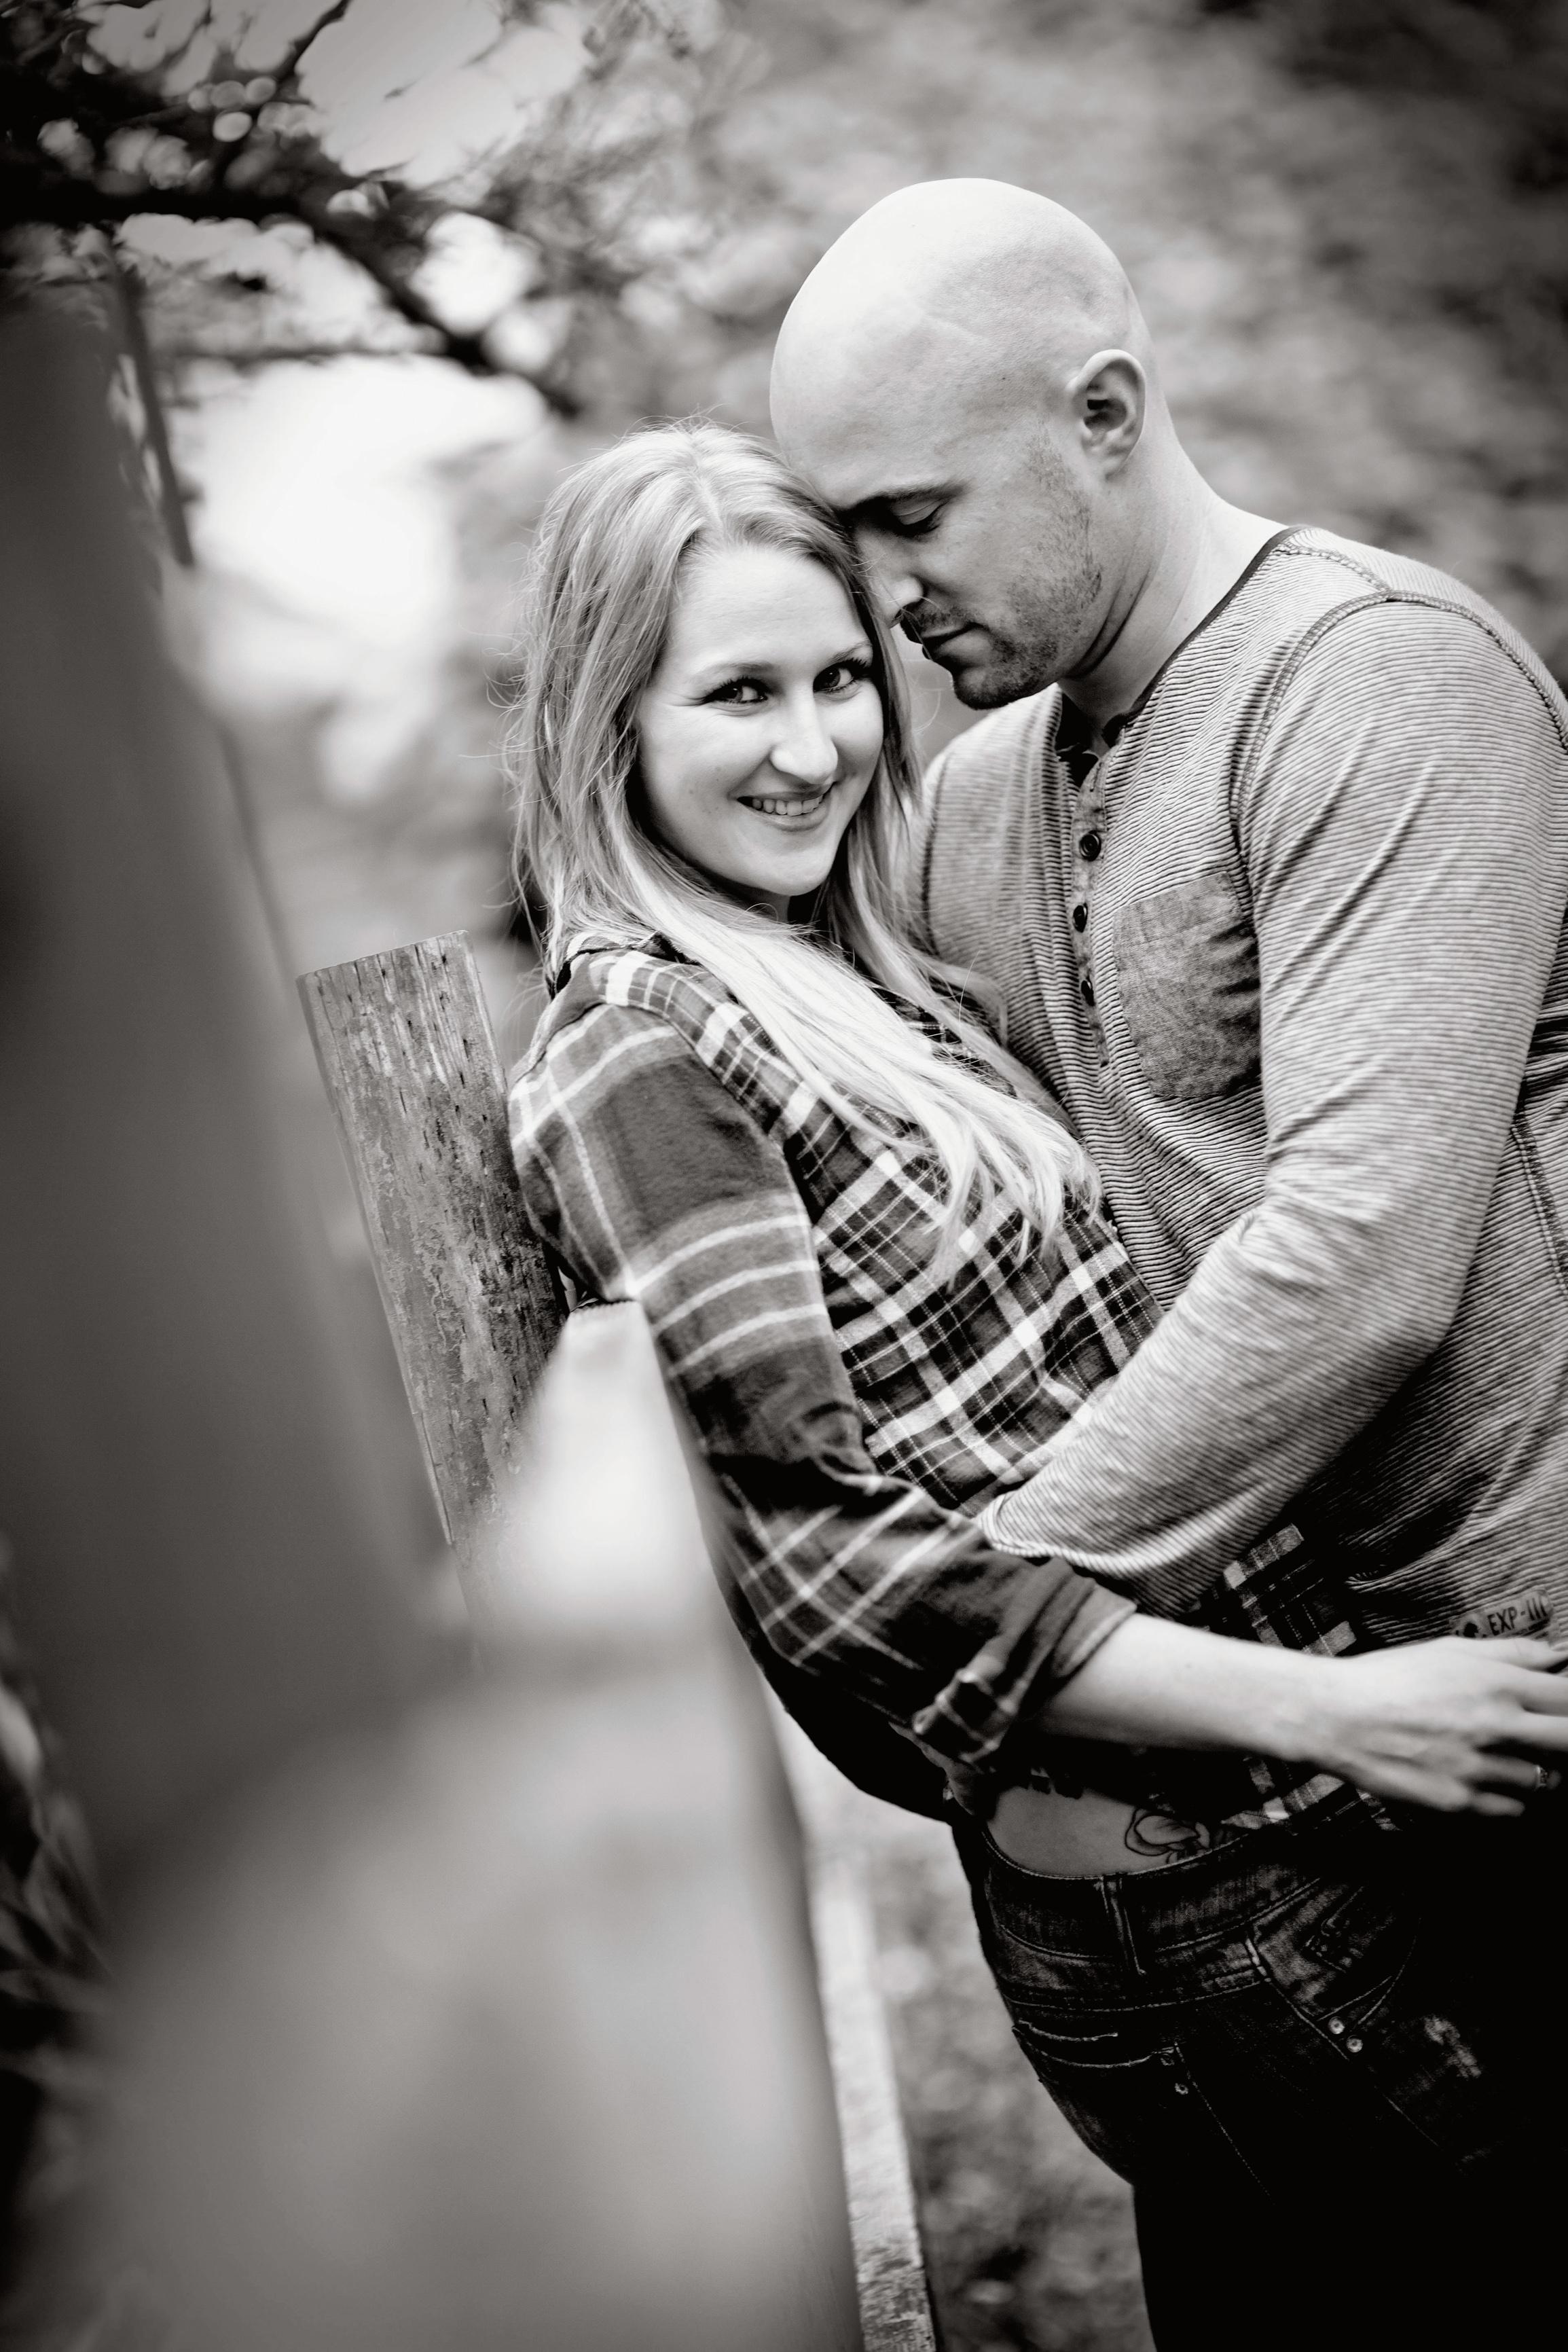 Portland+wedding+photographer+seattle+photography+0031.jpg